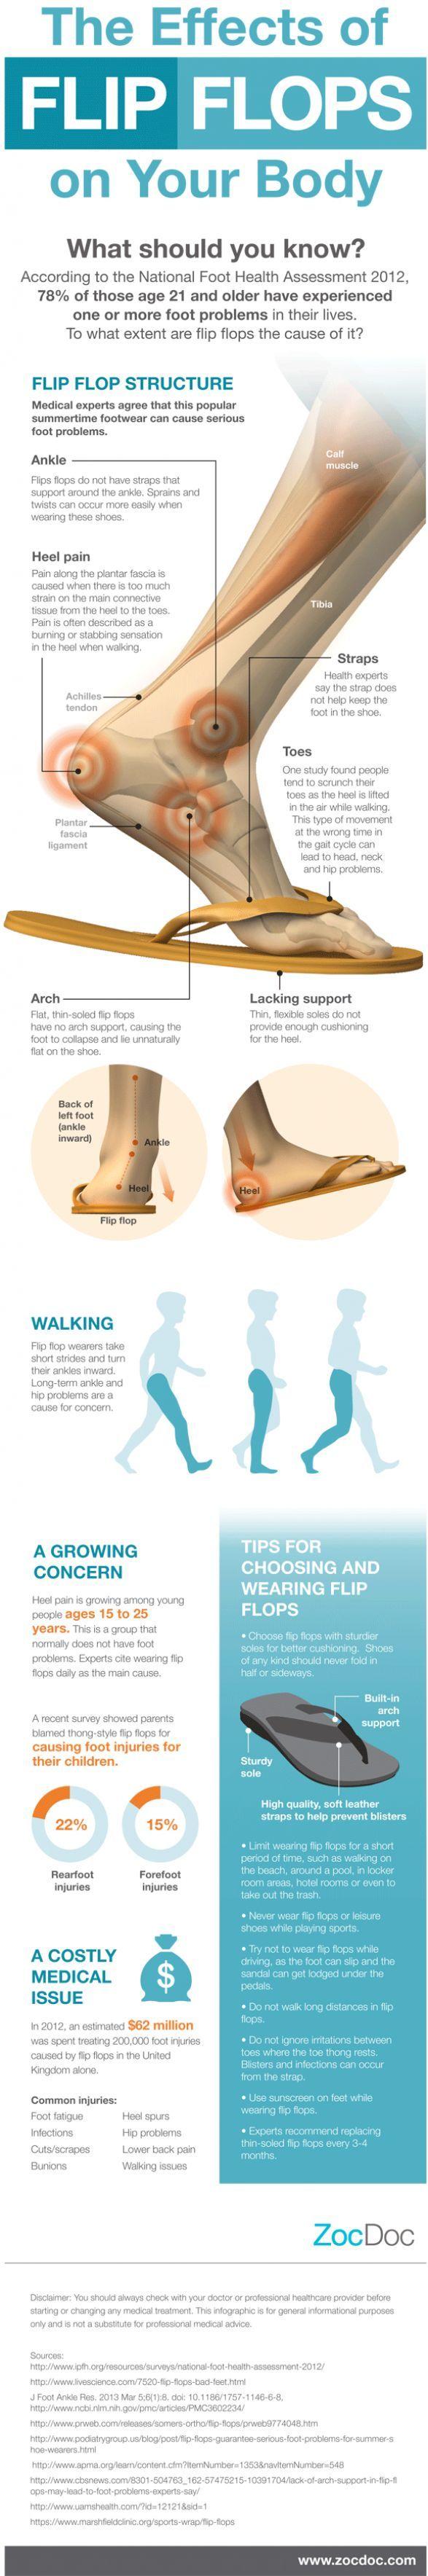 Health Effects Of Flip Flops On Your Feet via topoftheline99.com